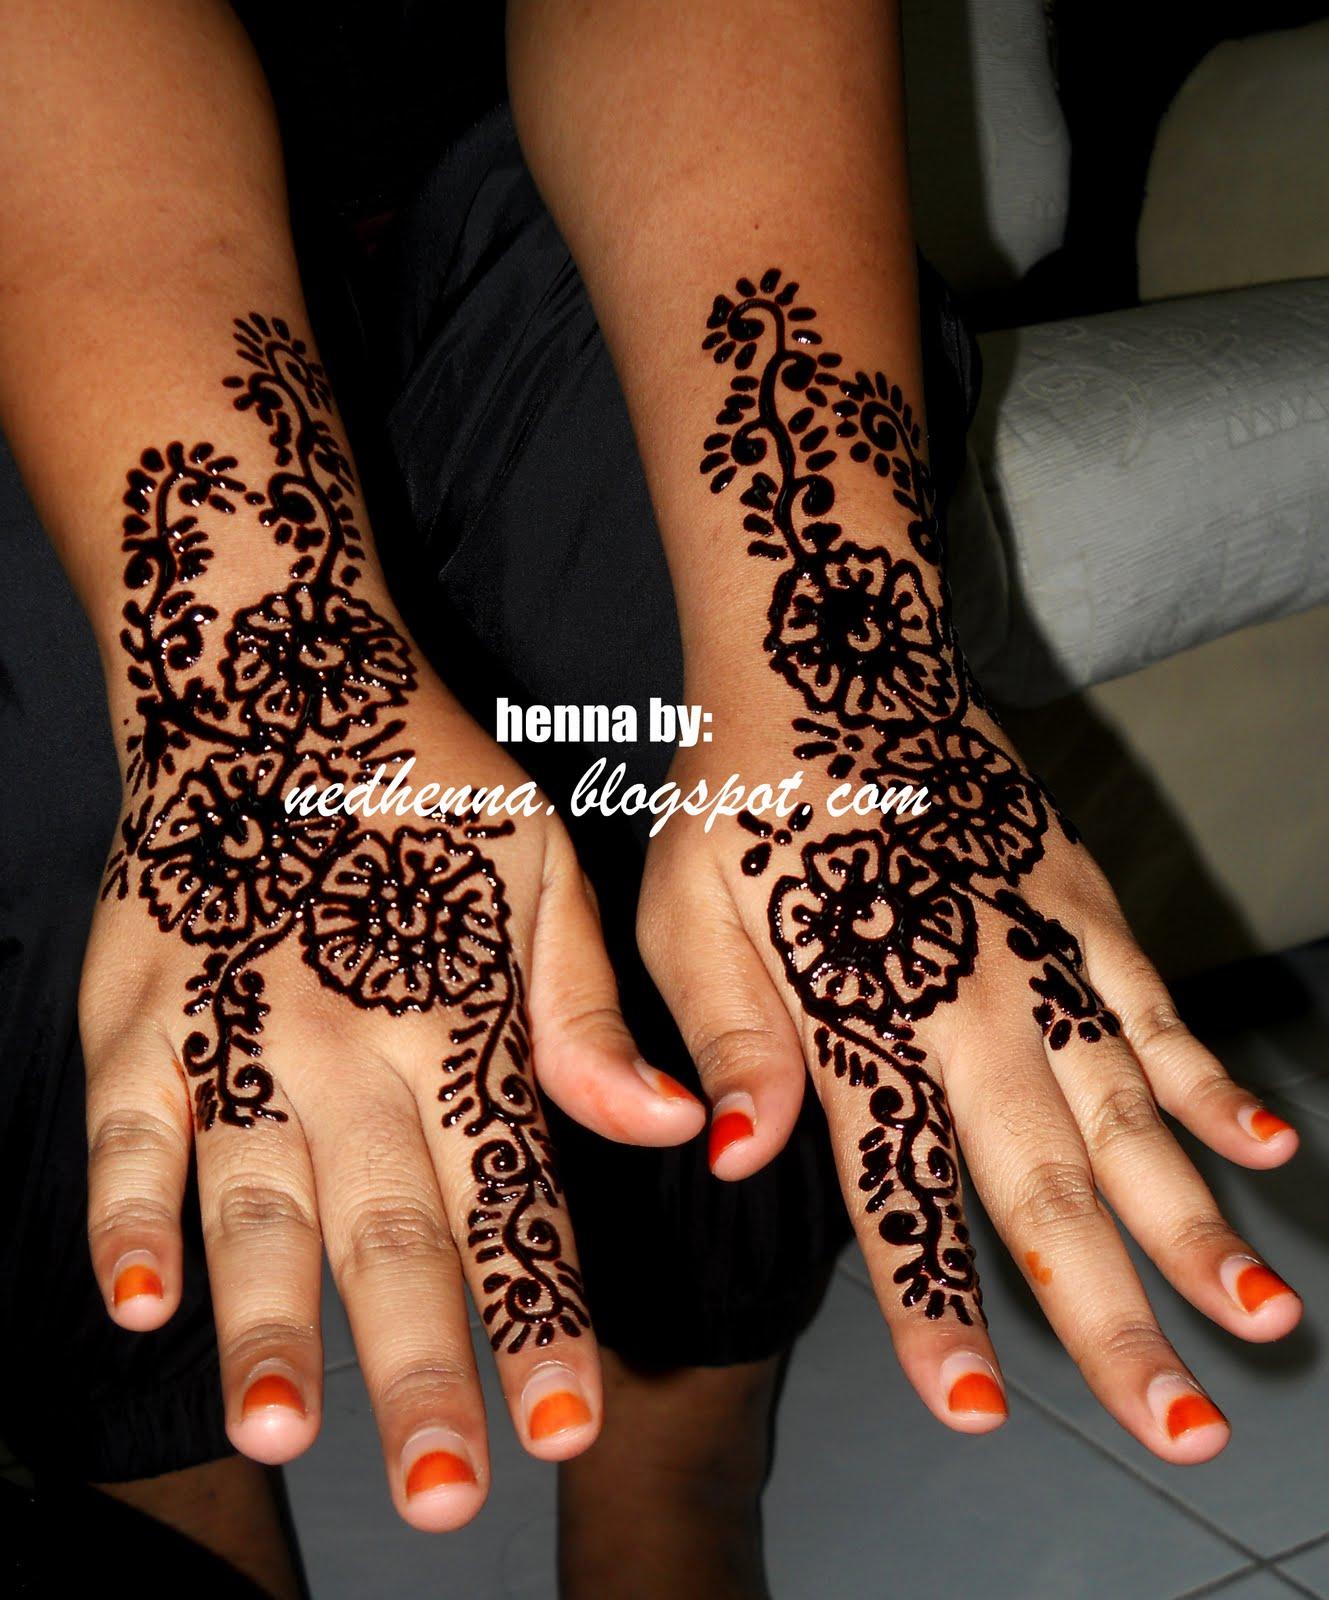 Henna Party Mehndi Kerucut Merah : Ned henna party suke ^^